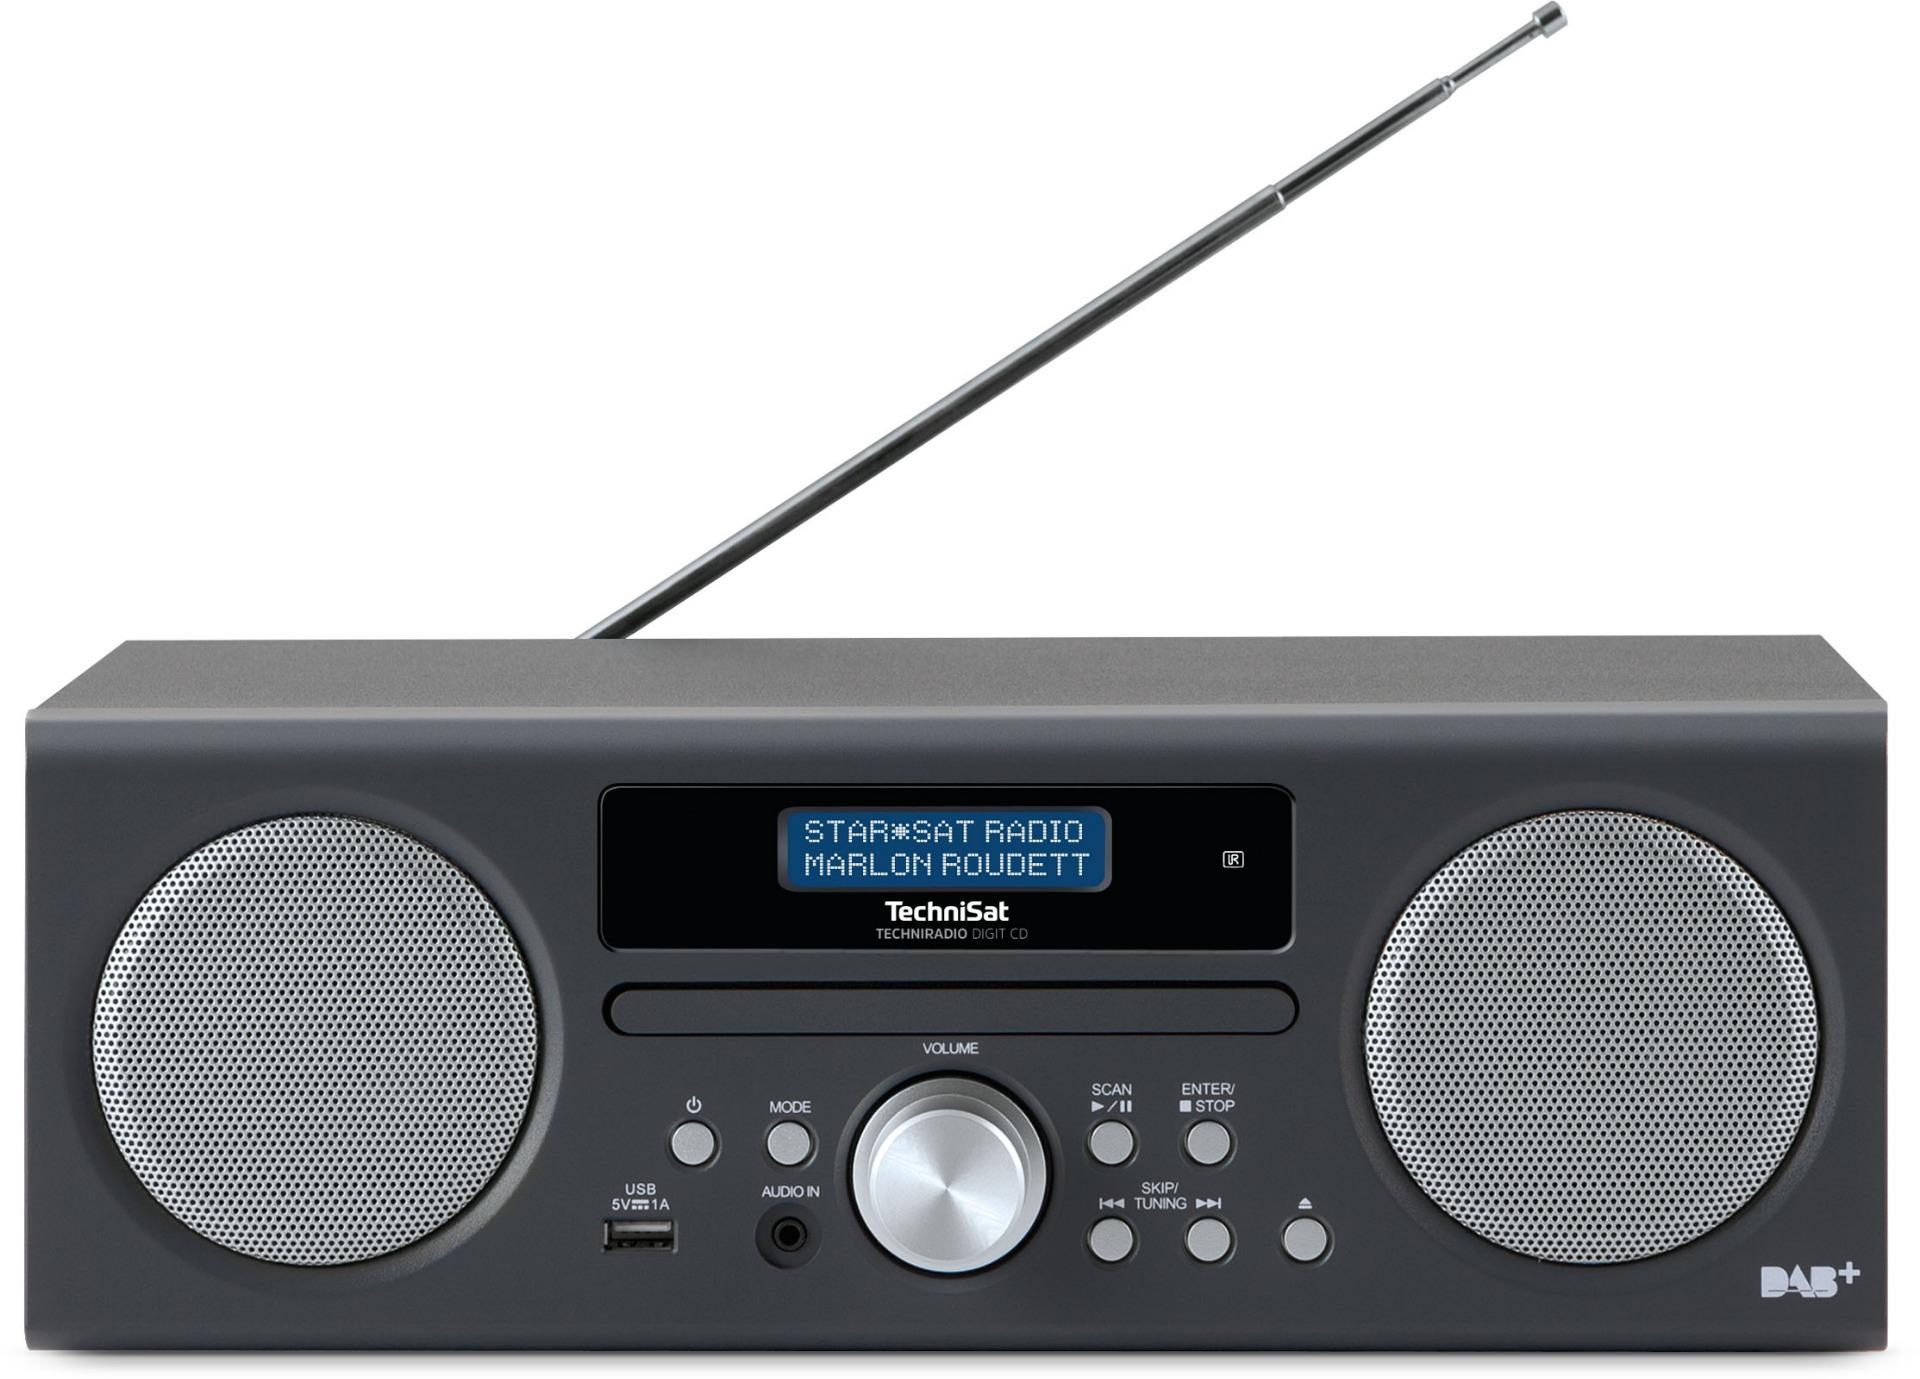 technisat techniradio dab digit digital radio with cd. Black Bedroom Furniture Sets. Home Design Ideas